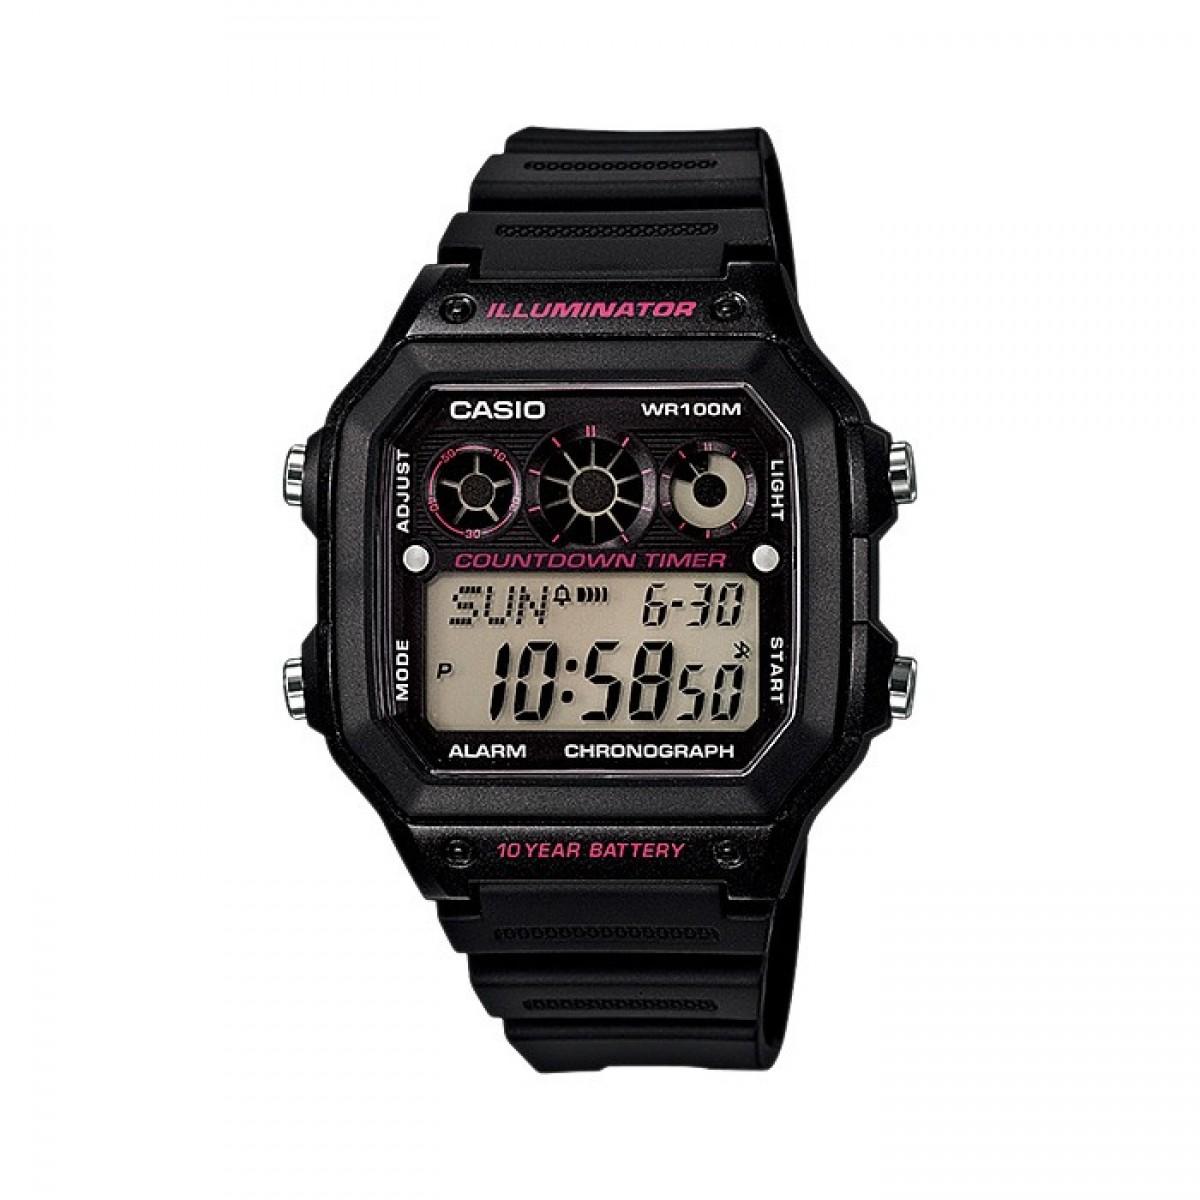 Часовник Casio AE-1300WH-1A2VEF